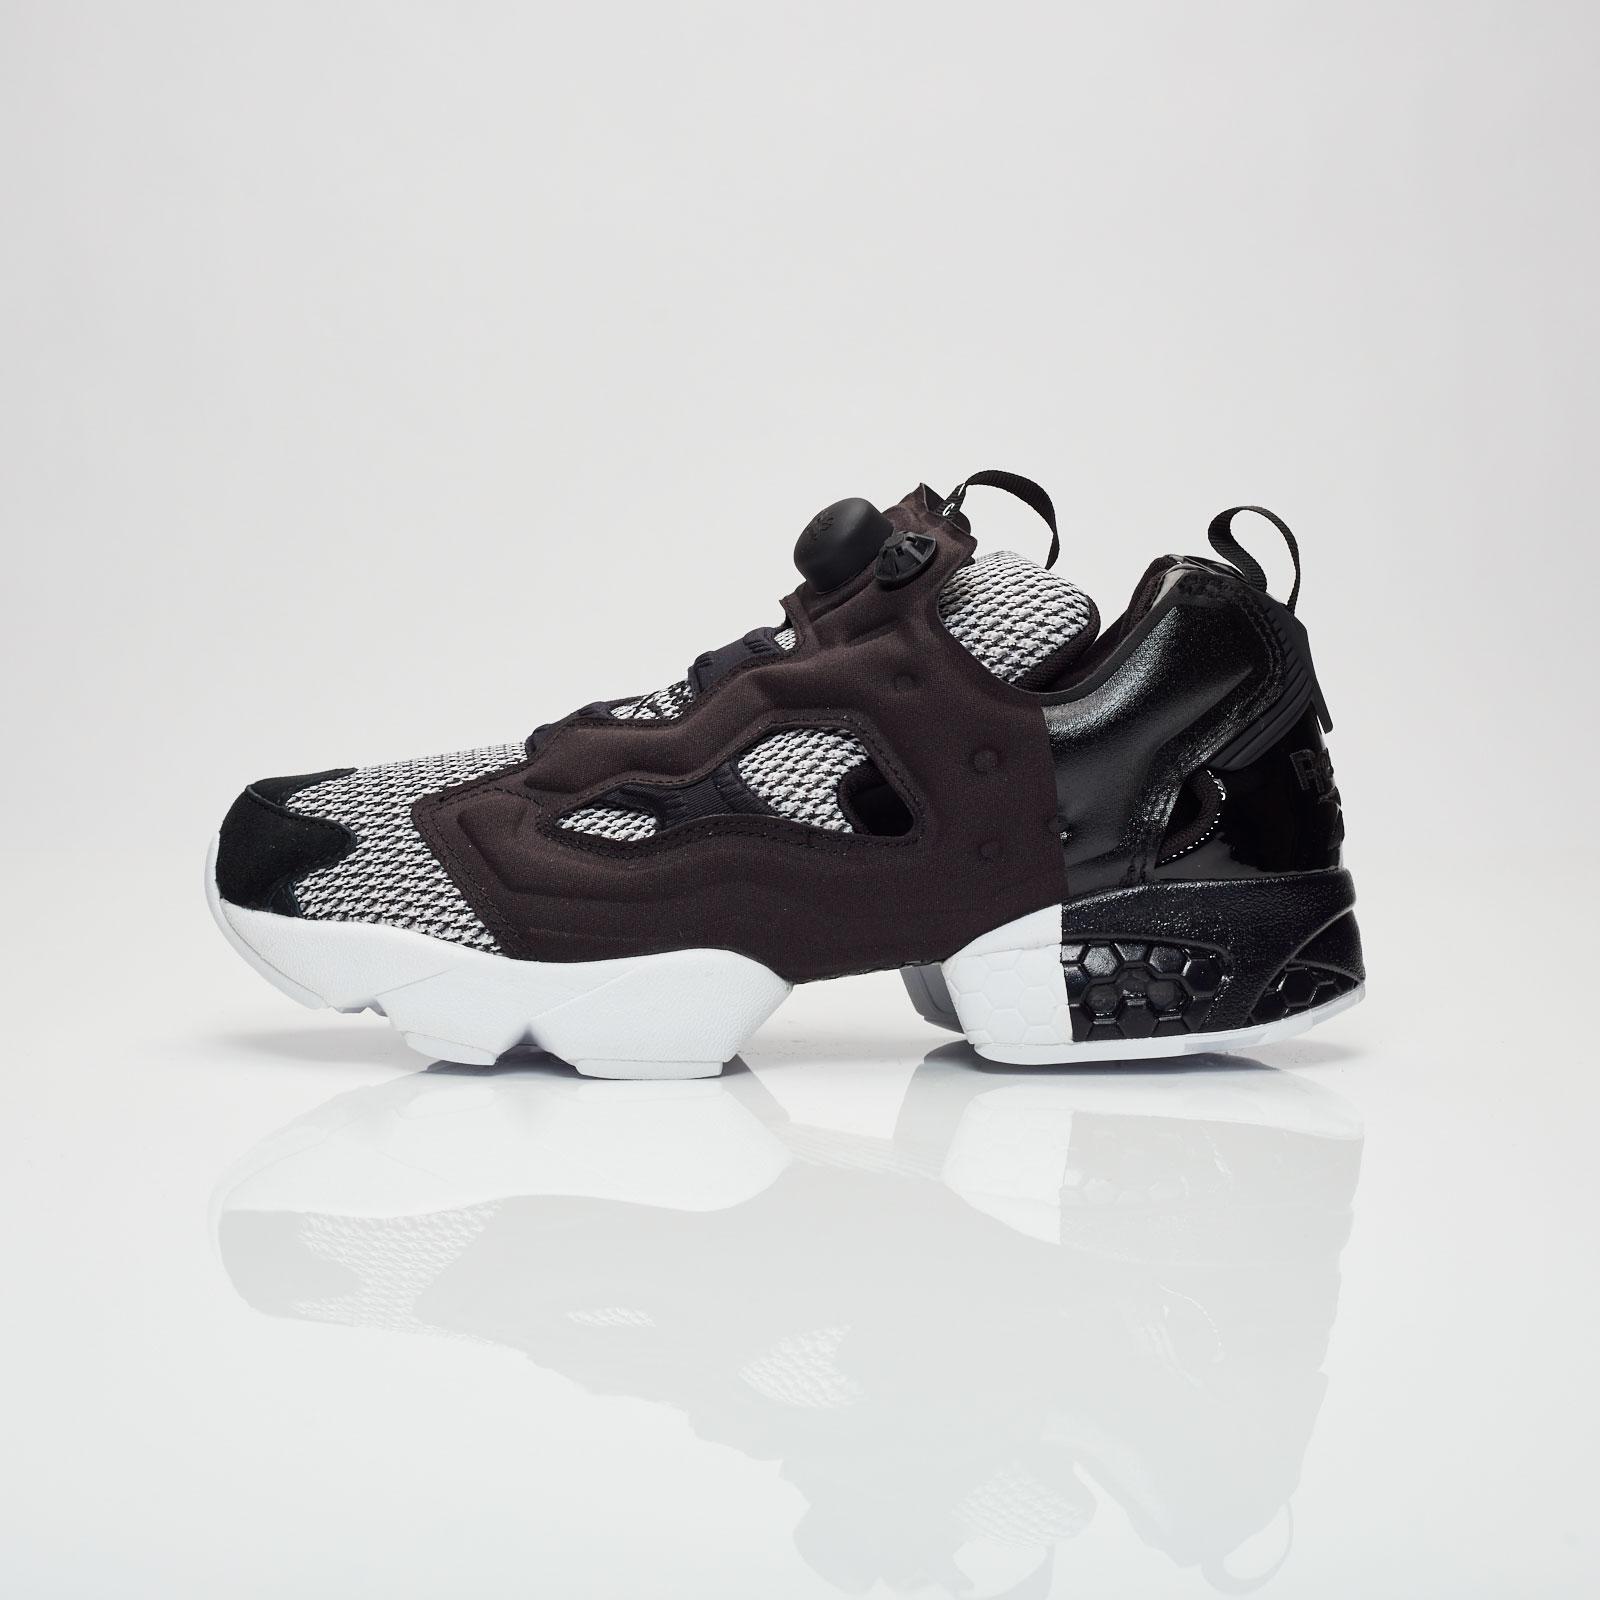 3927a3793c5 Reebok Black Scale X Instapump Fury Og - Bd5009 - Sneakersnstuff ...